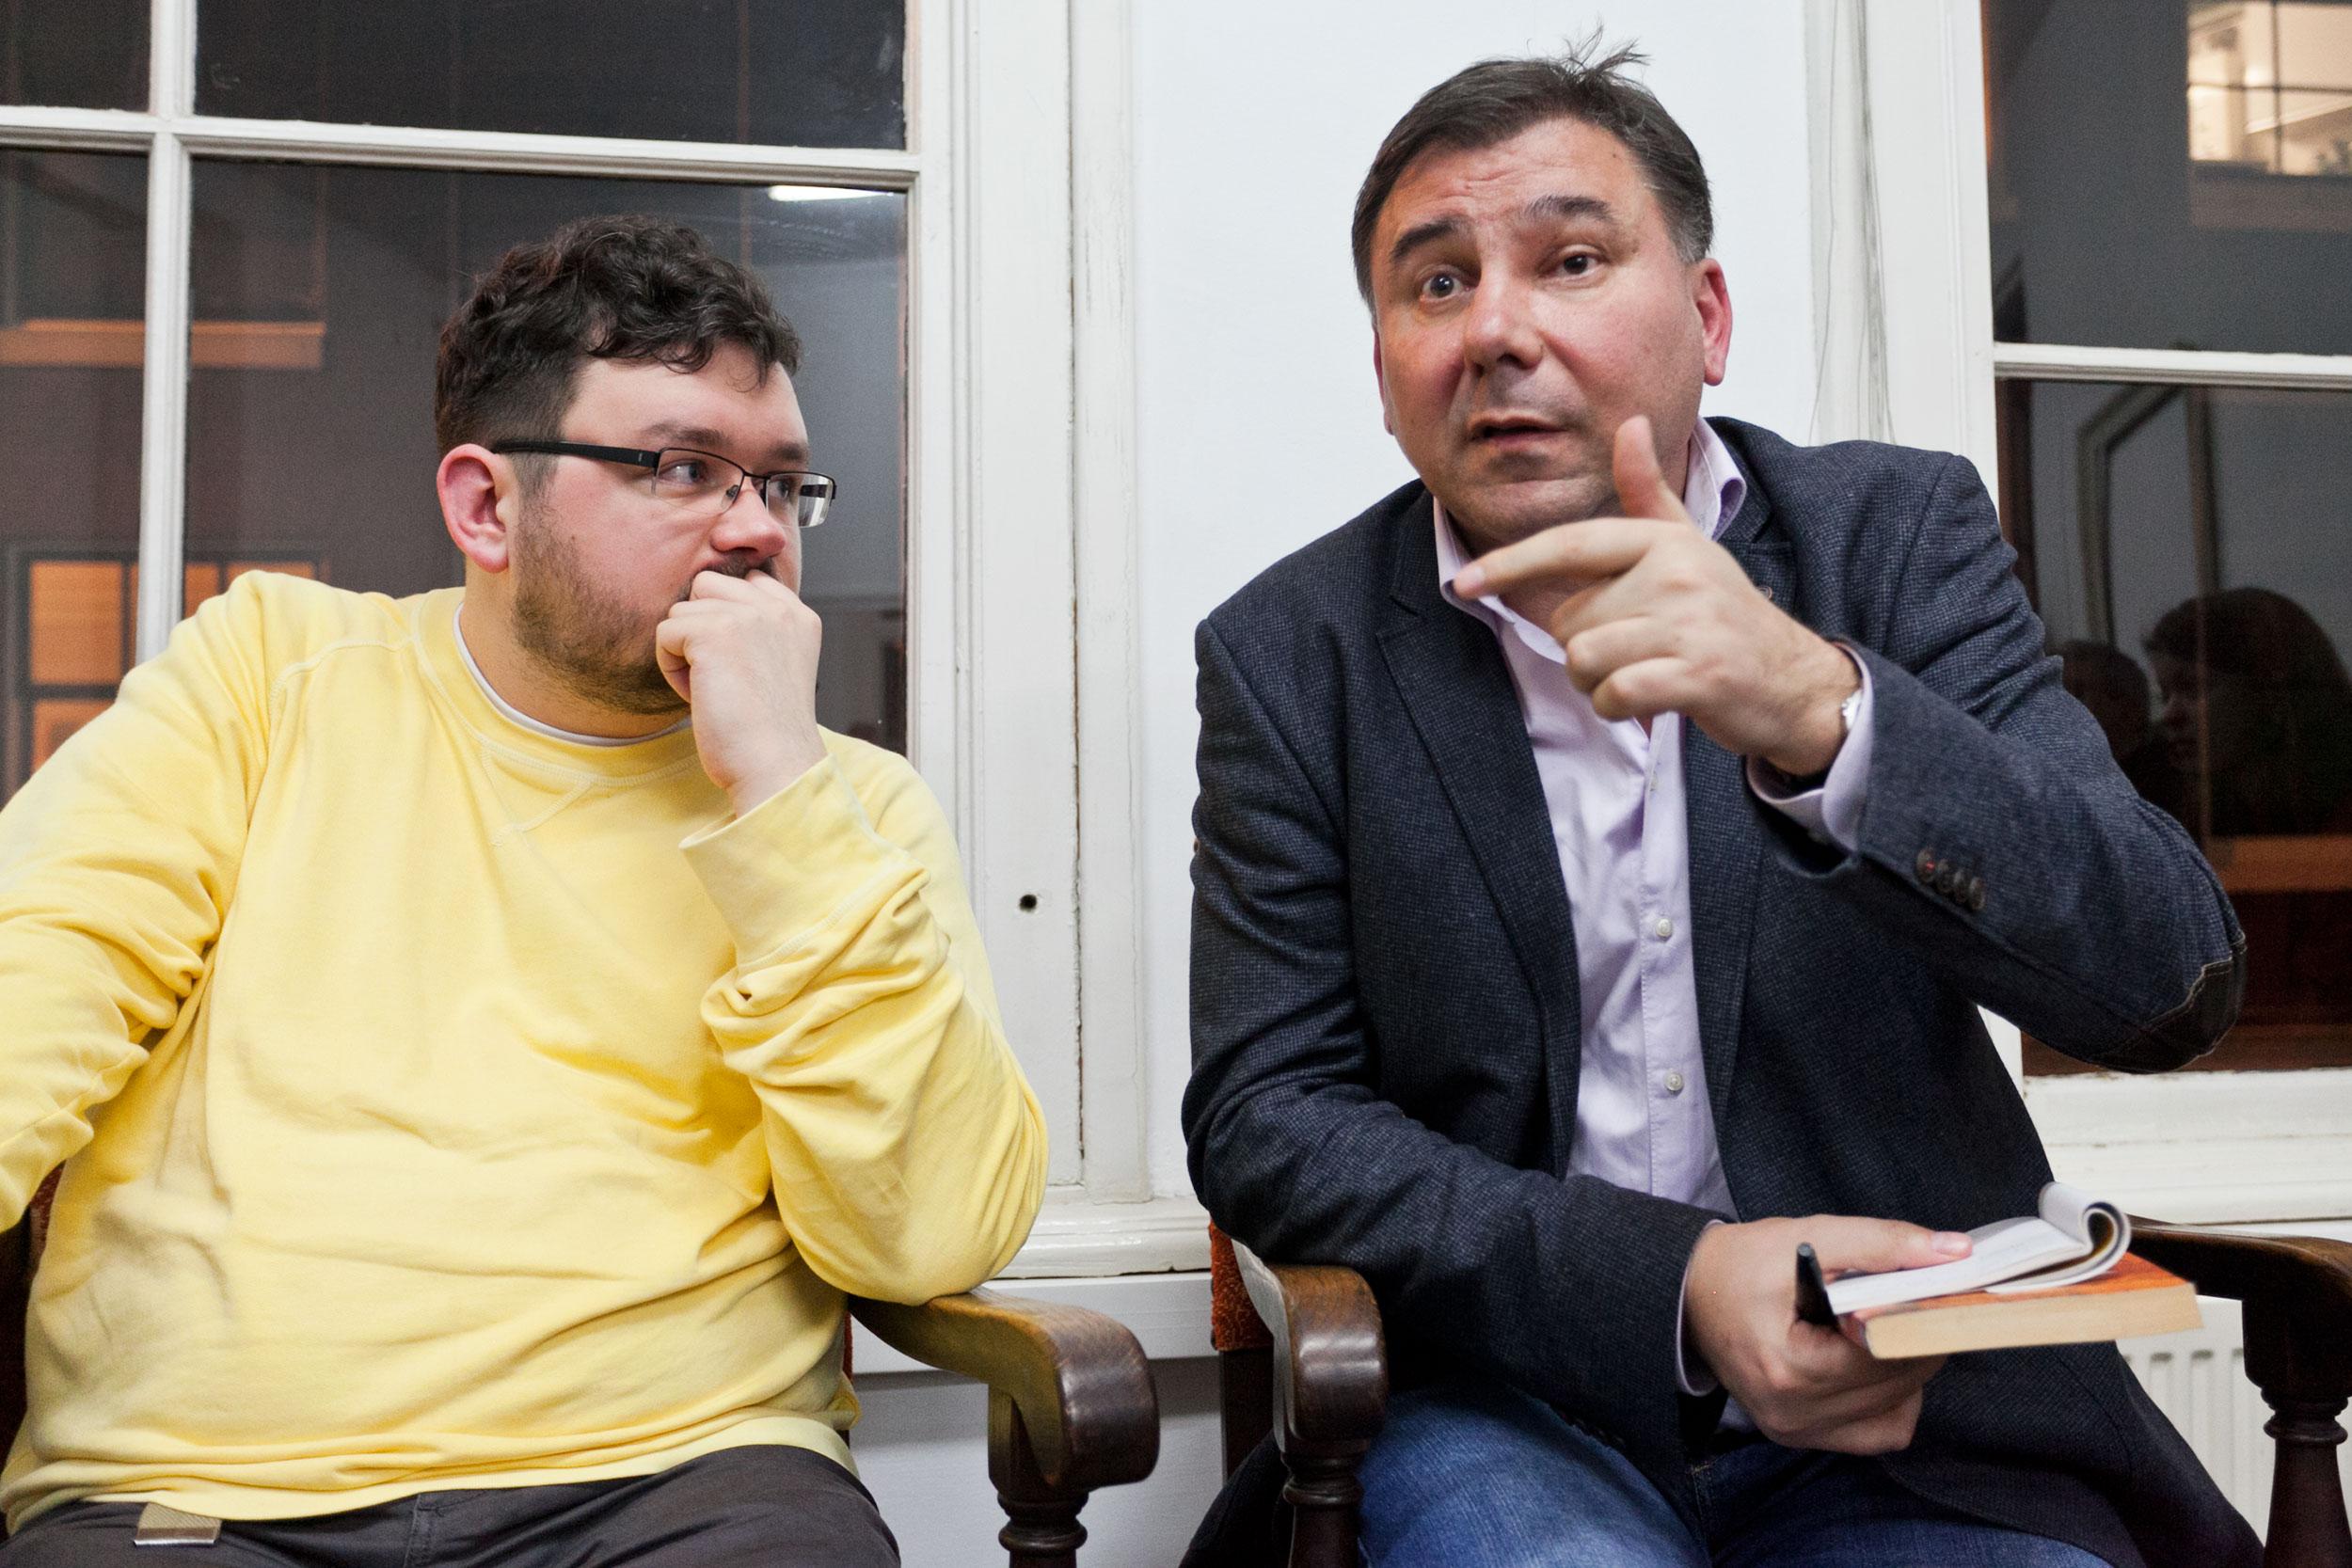 Mykhailo Glubokyi and Ivan Krastev. Photo by Pip Erken.